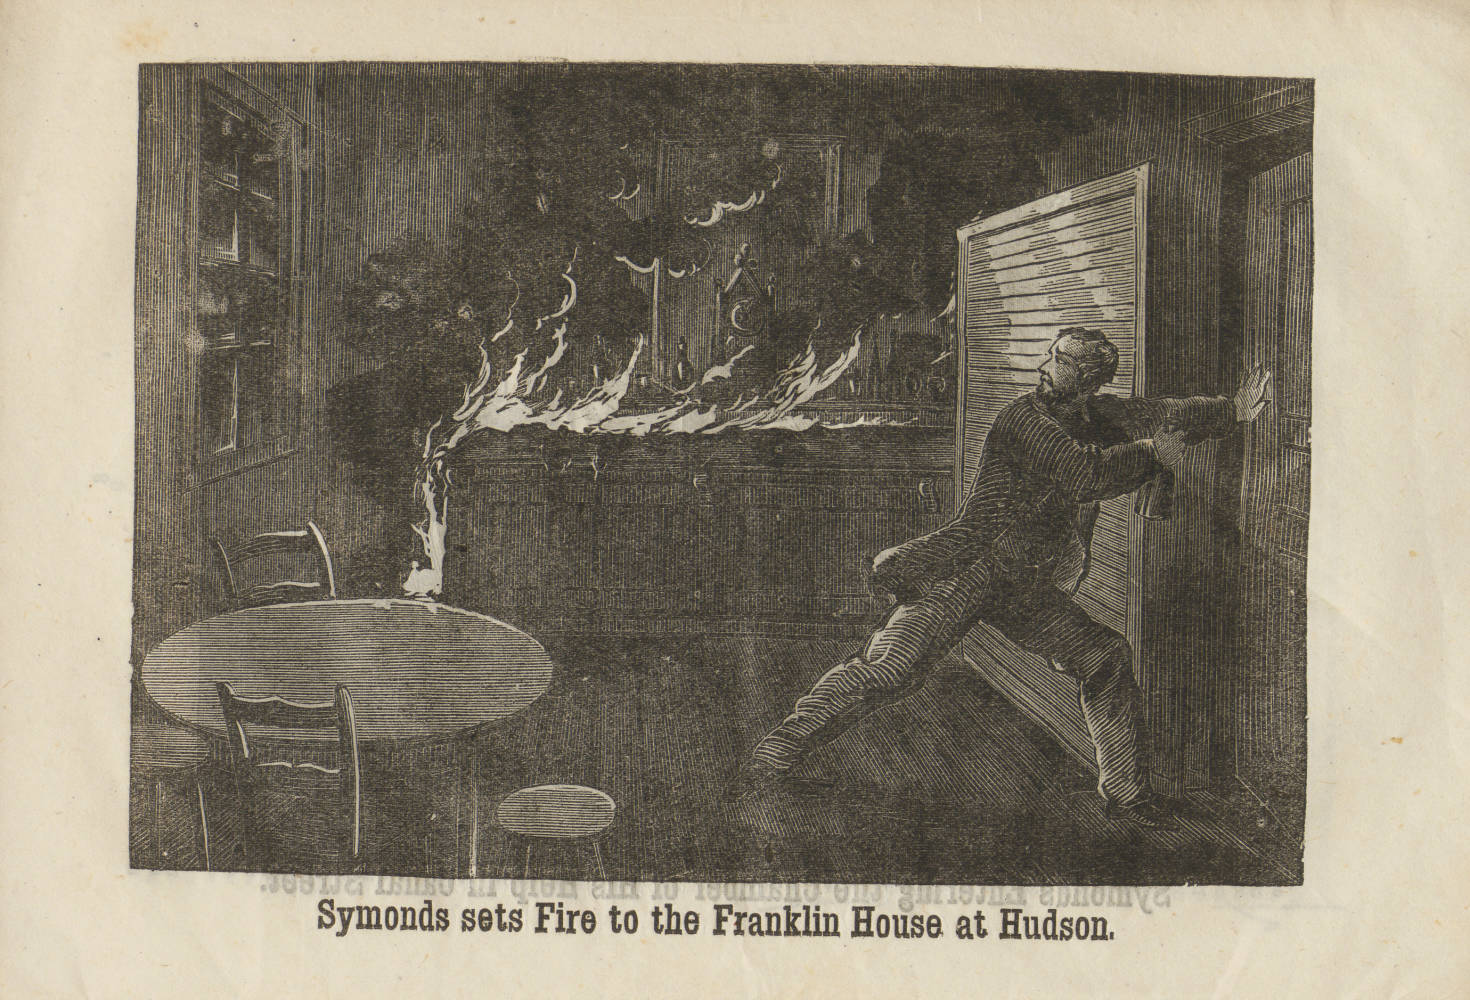 Illustration: Symonds sets fire to the Franklin House at Hudson.